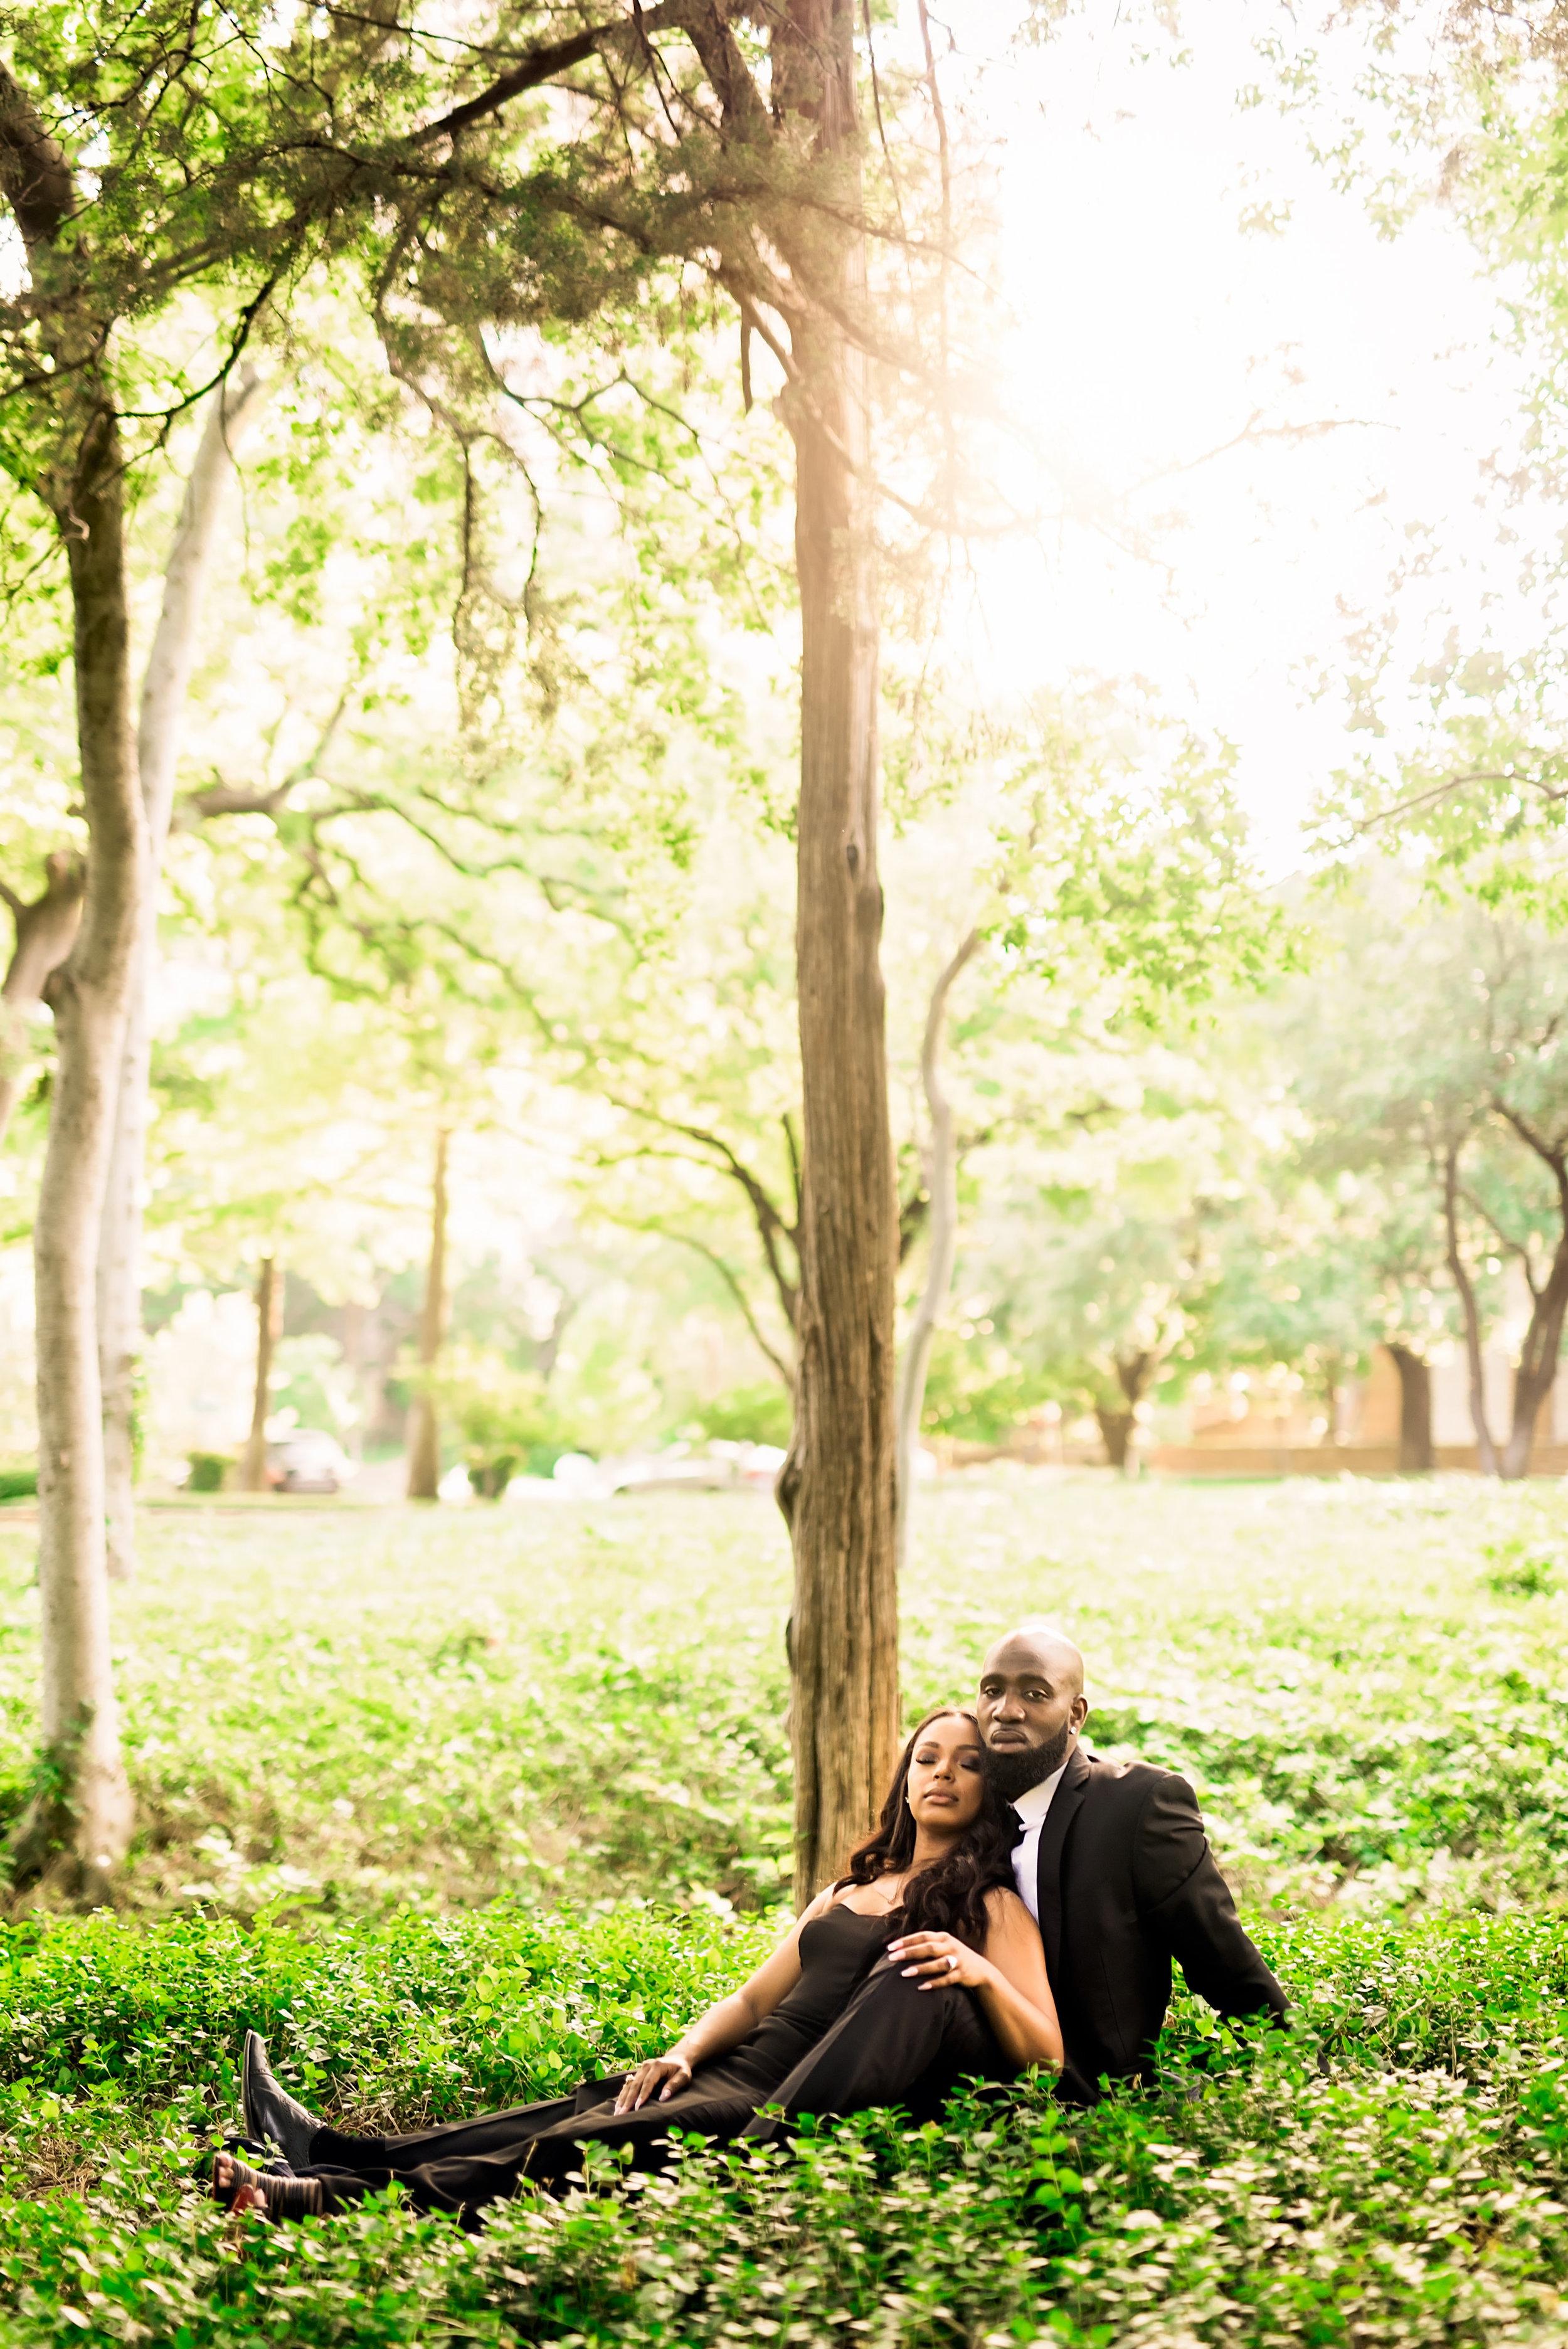 Pharris-Photos-Jessica-Quincy-Acy- Engagement-0030.jpg